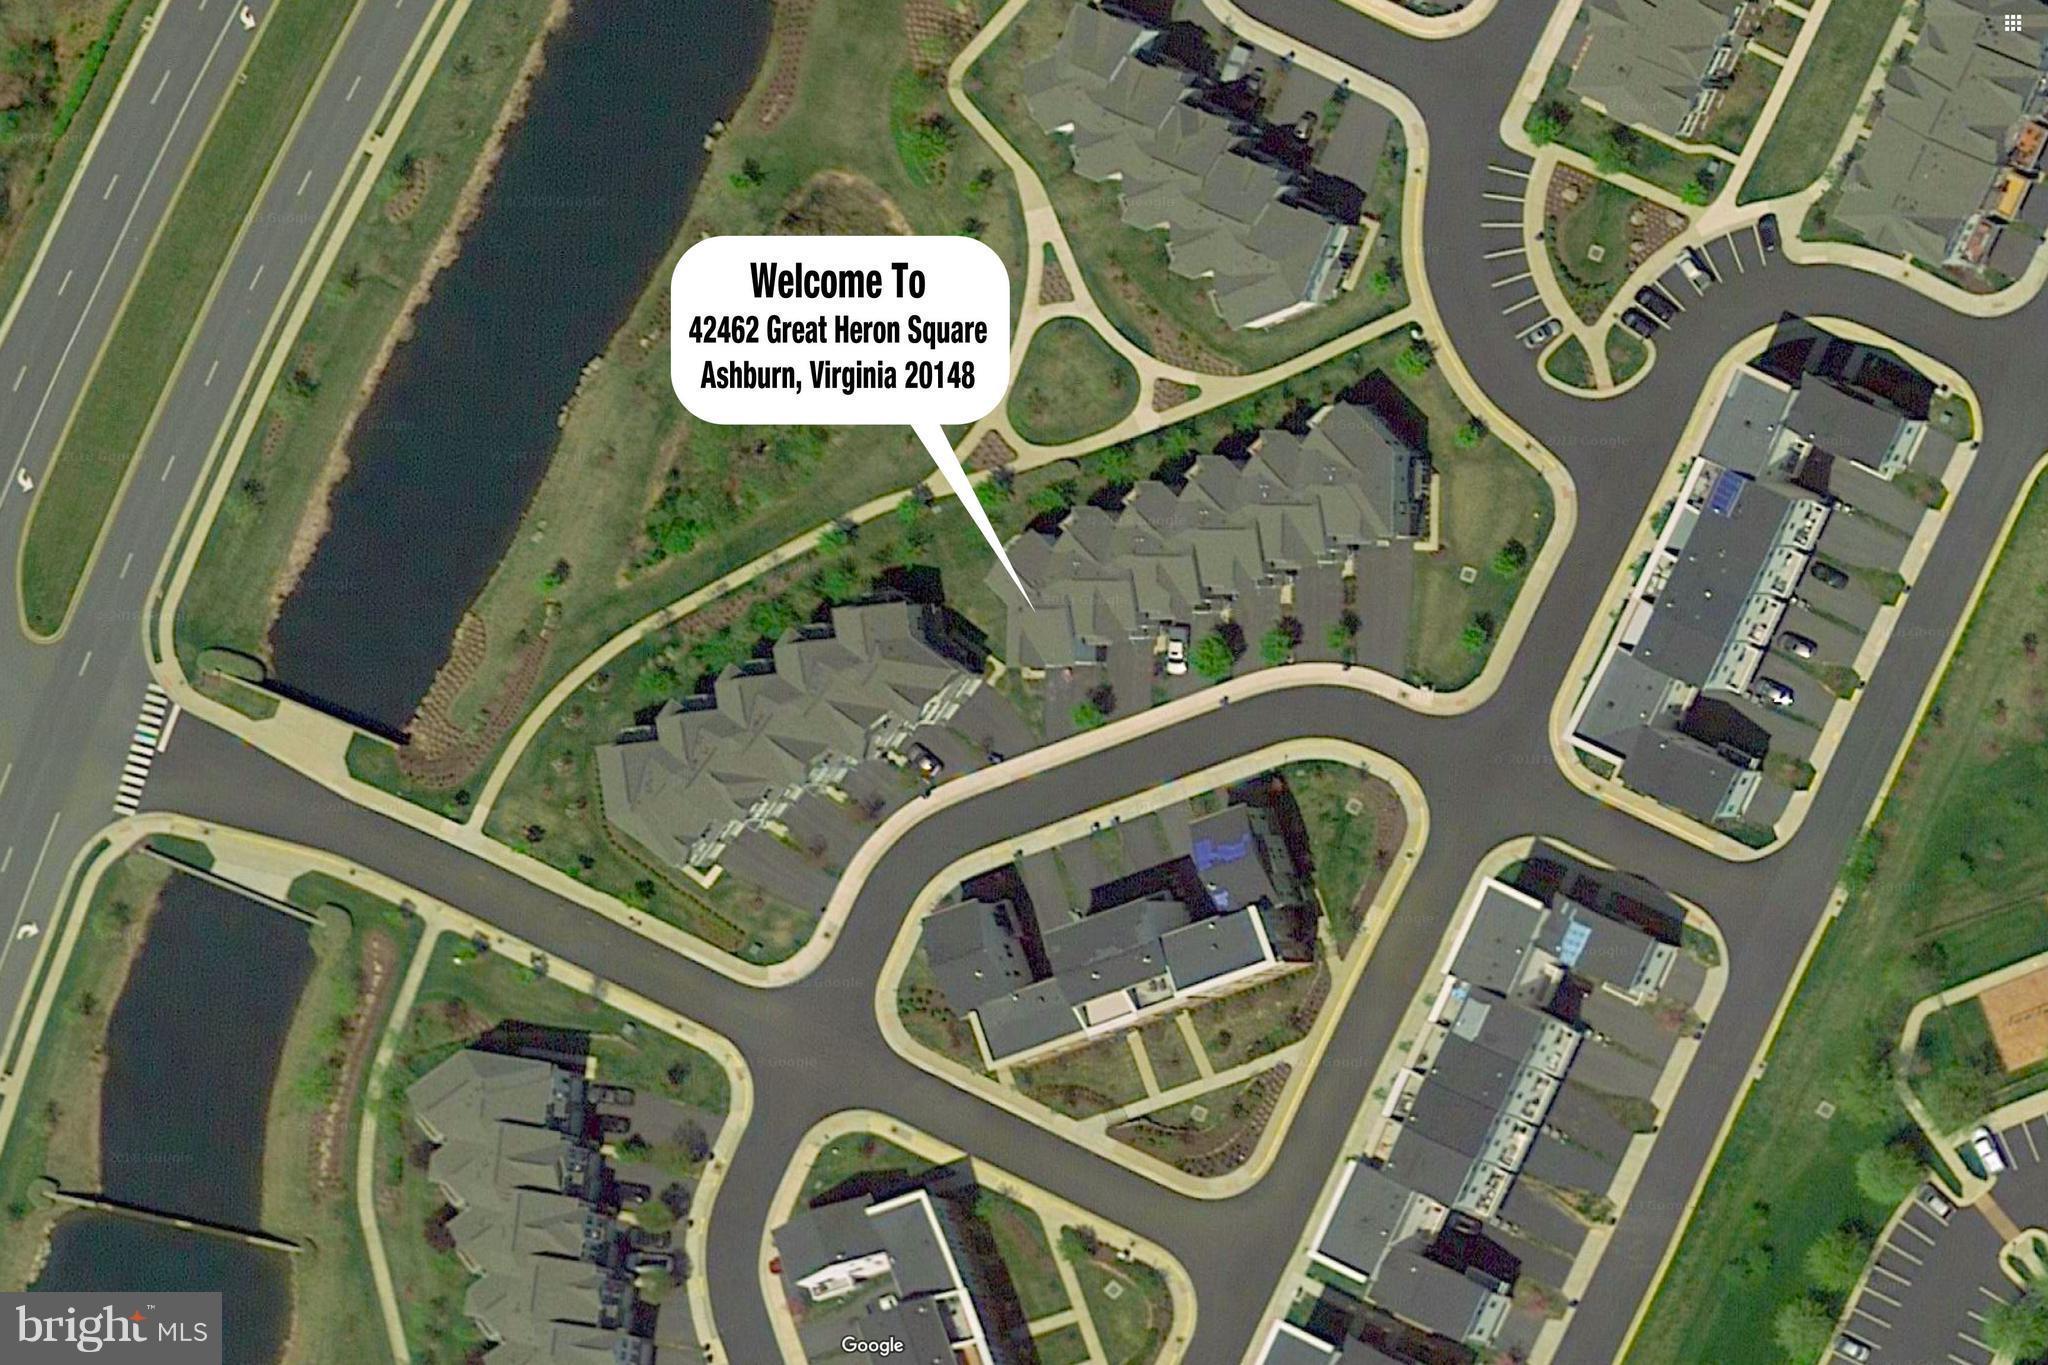 42462 GREAT HERON SQUARE, Ashburn, VA 20148